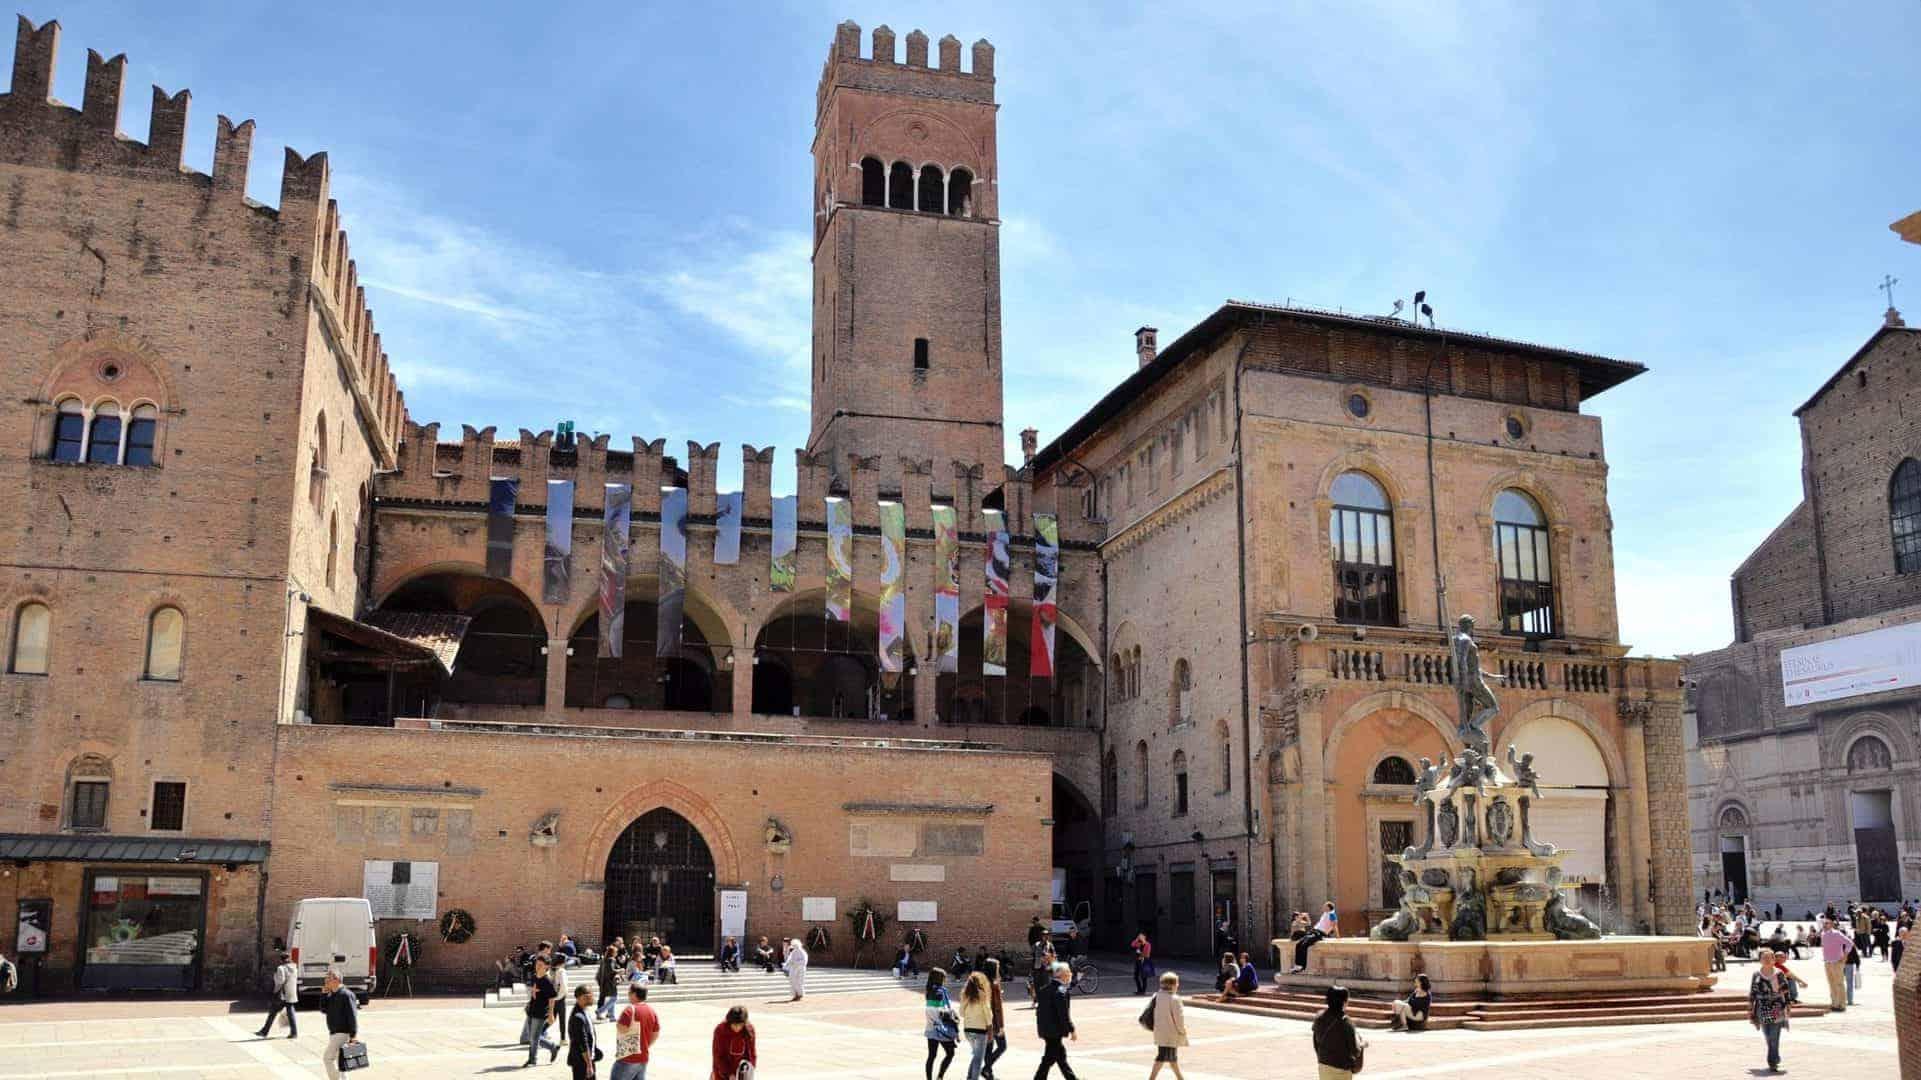 bologna_essential10) Palazzo Re Enzo (wikimediacommons)